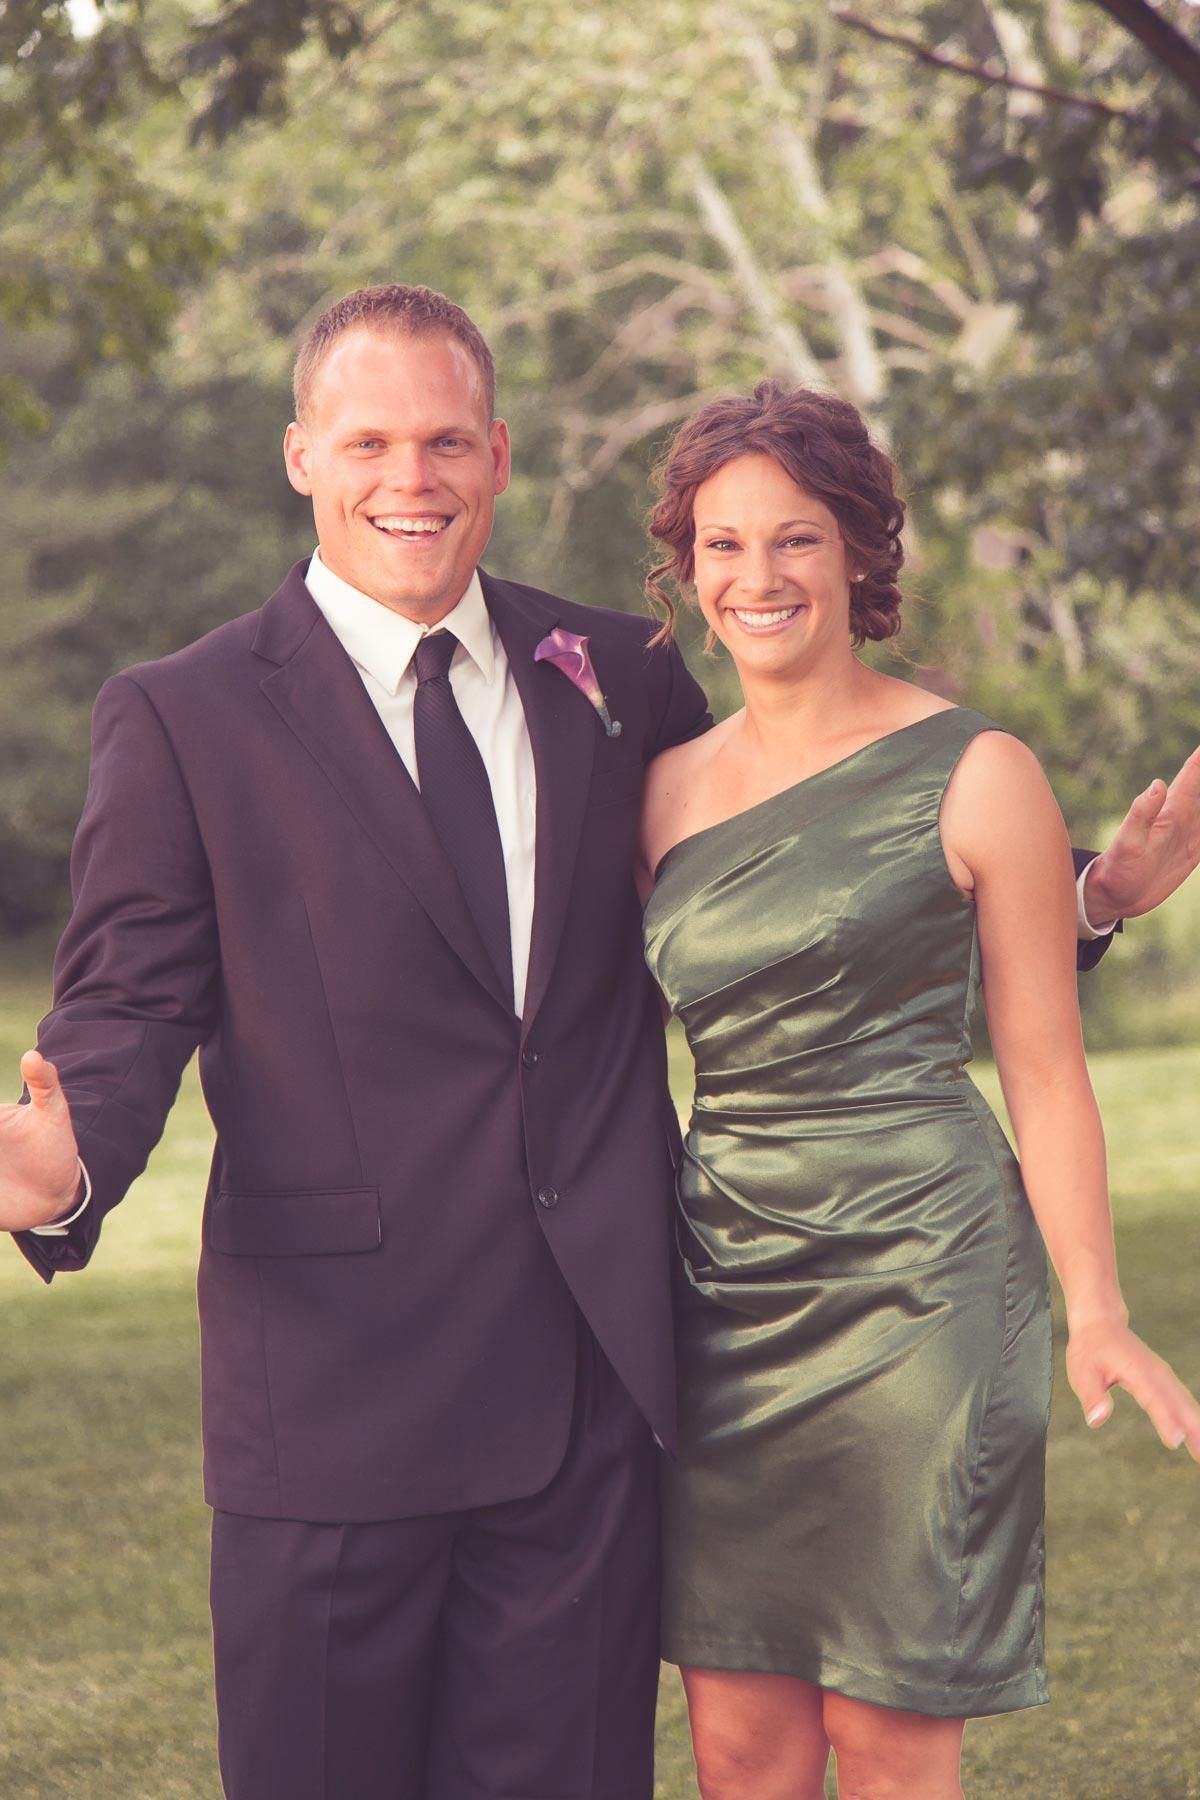 evansville-wedding-photographer-pabst-photo-kokies-echo-valley-(40)